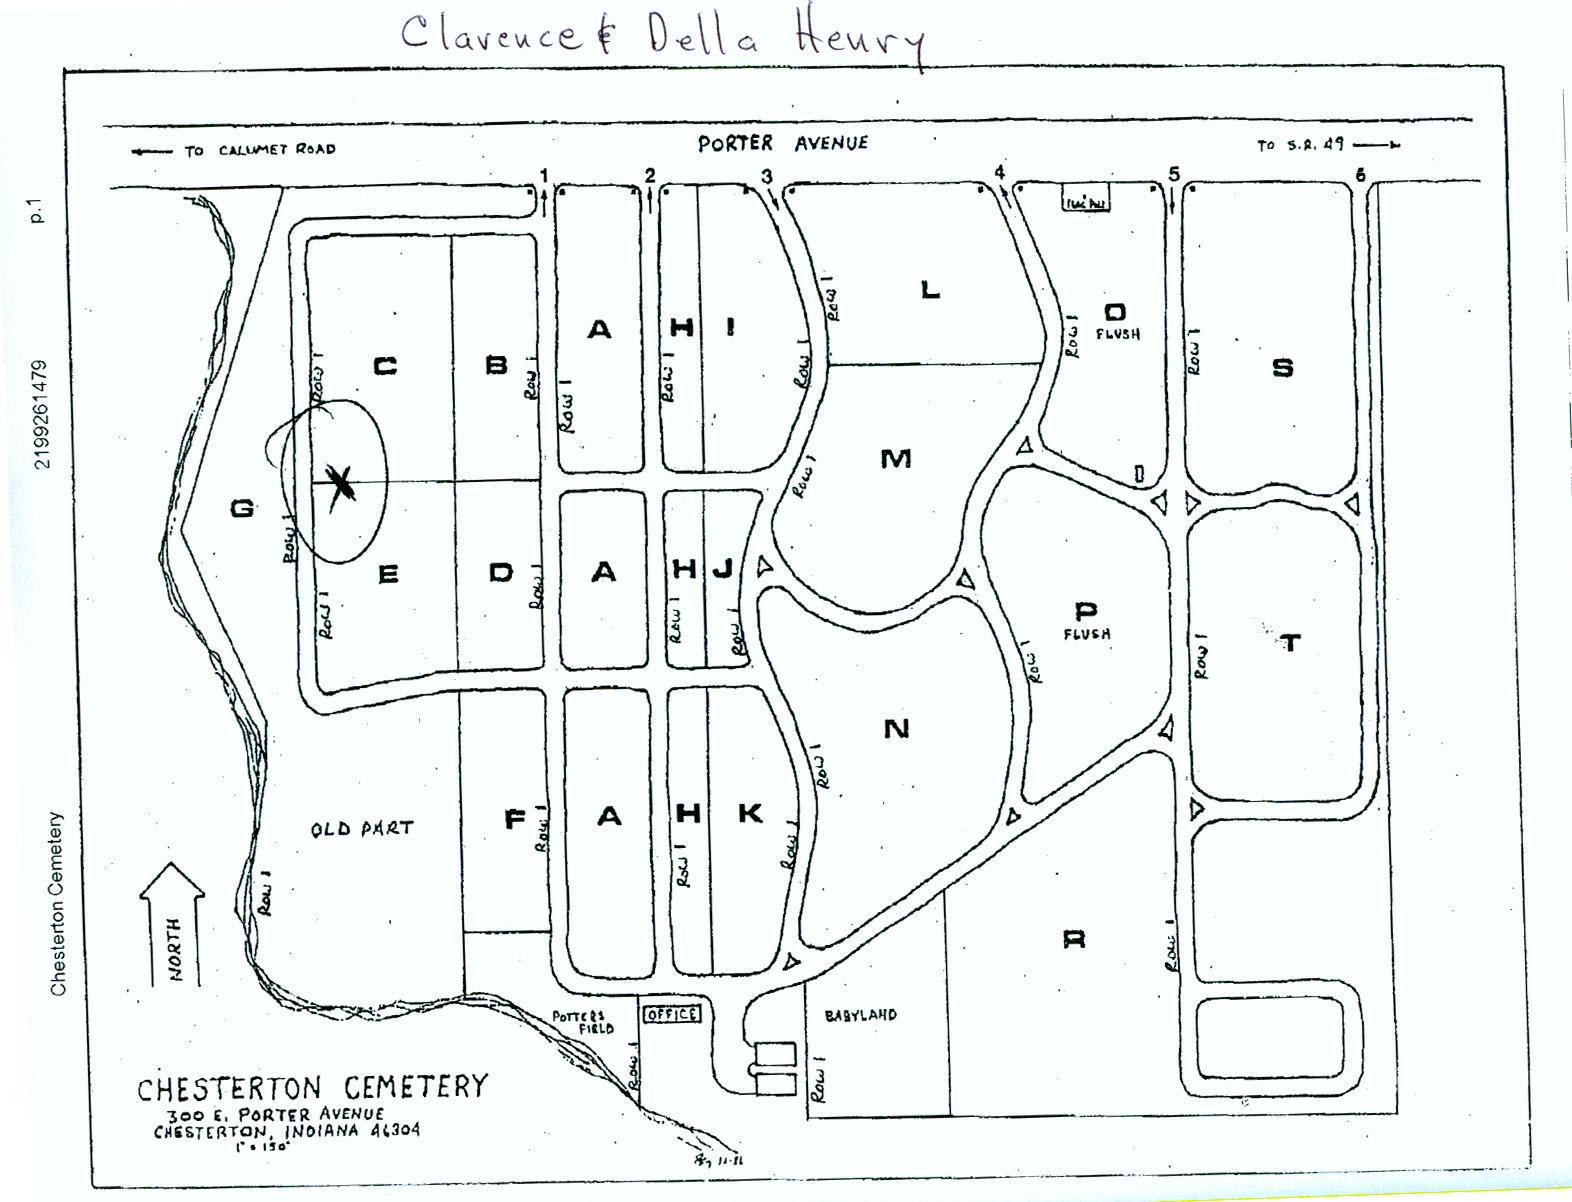 Chesterton Cemetery